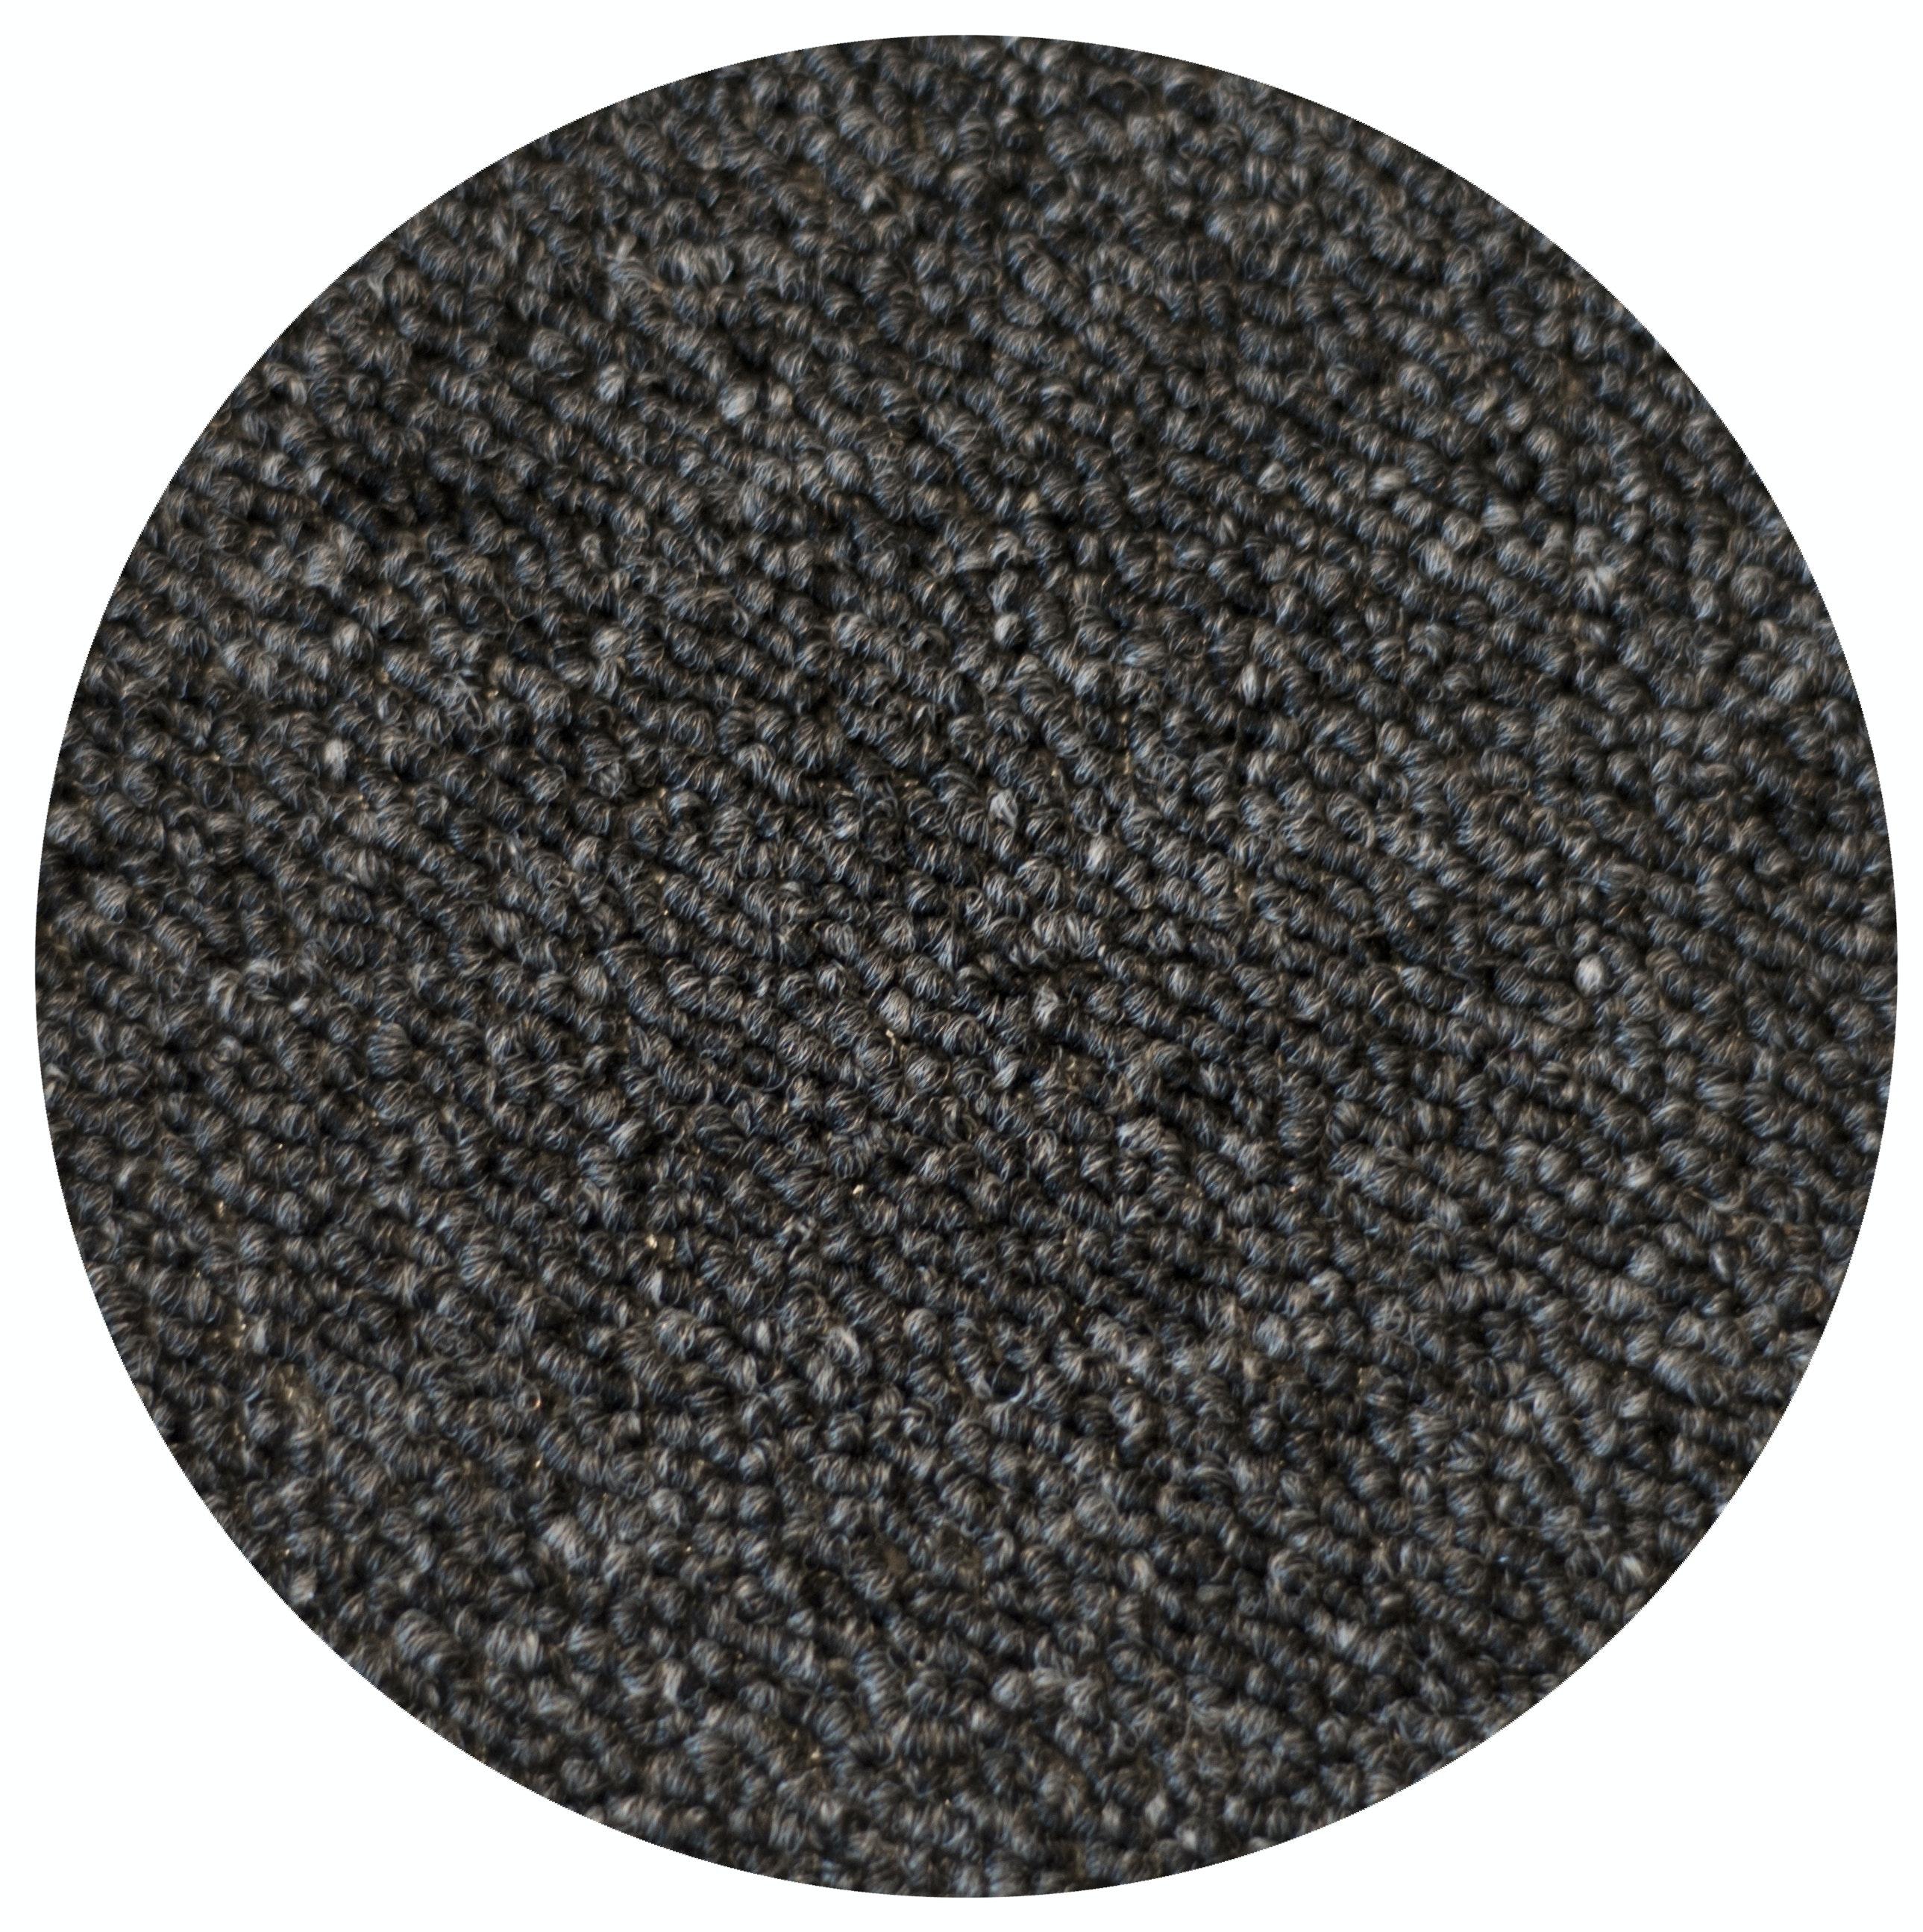 Textilgolv Heltäckningsmatta Fibertrone Basic 10m², Antracit 94